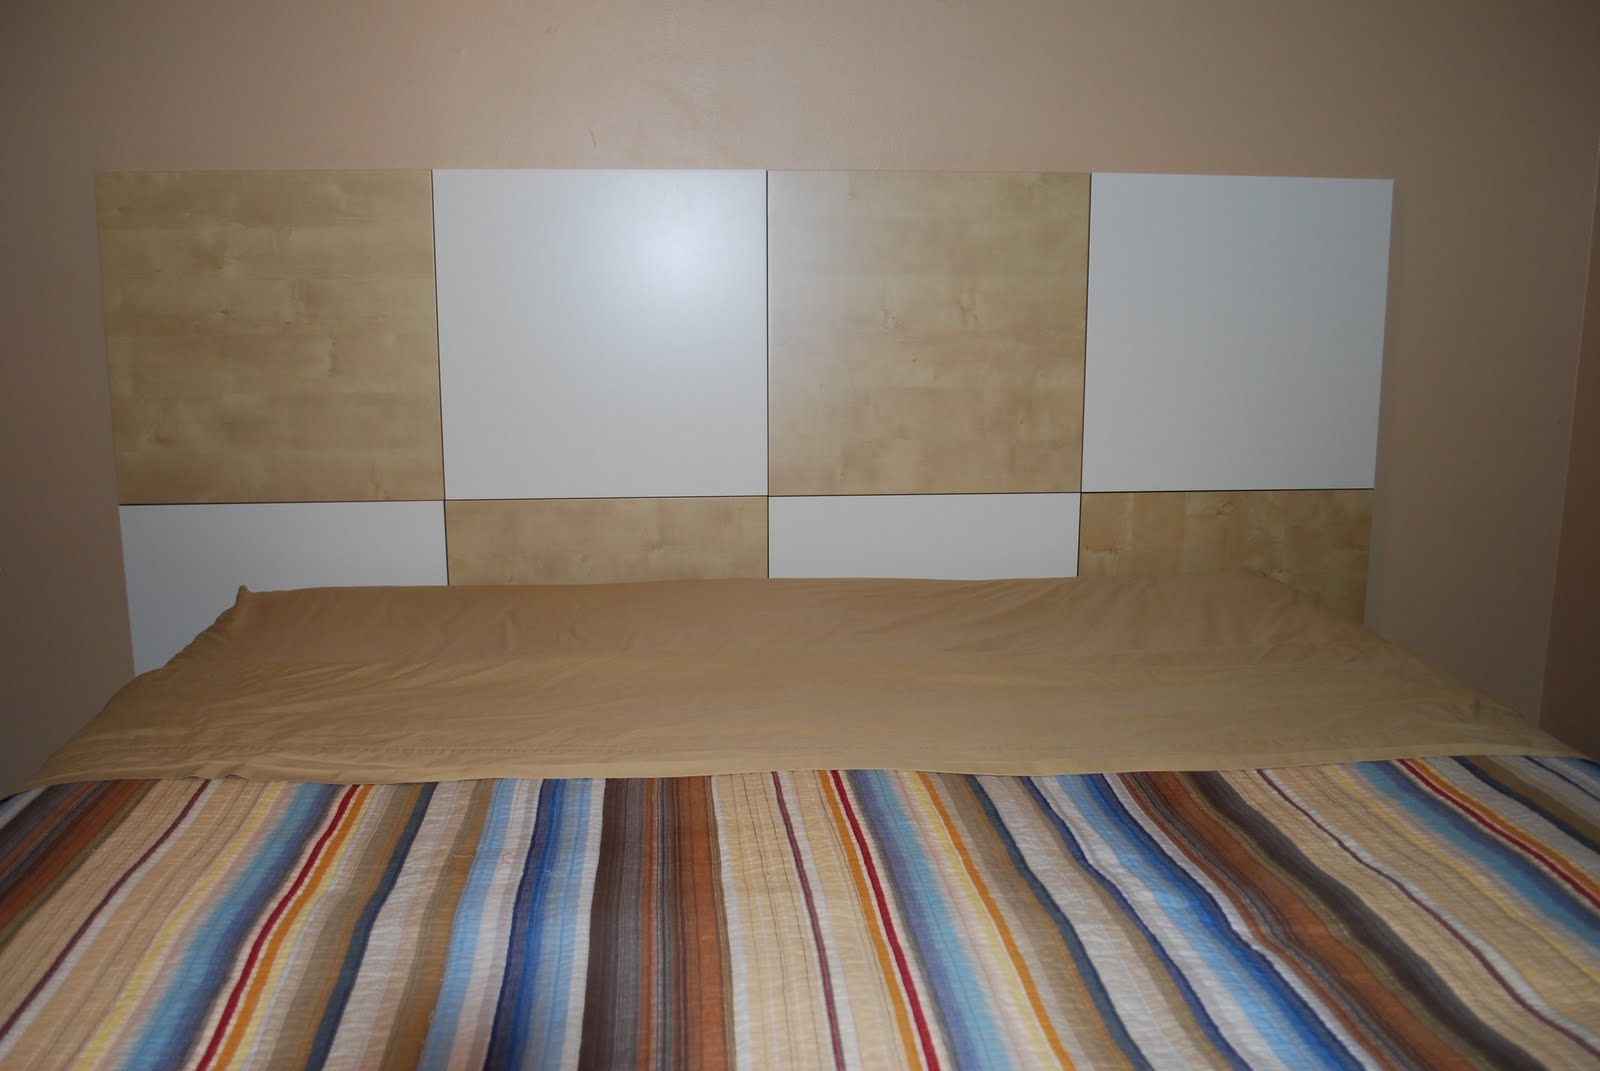 Cali King Lackable Headboard And Platform Bed Frame Ikea